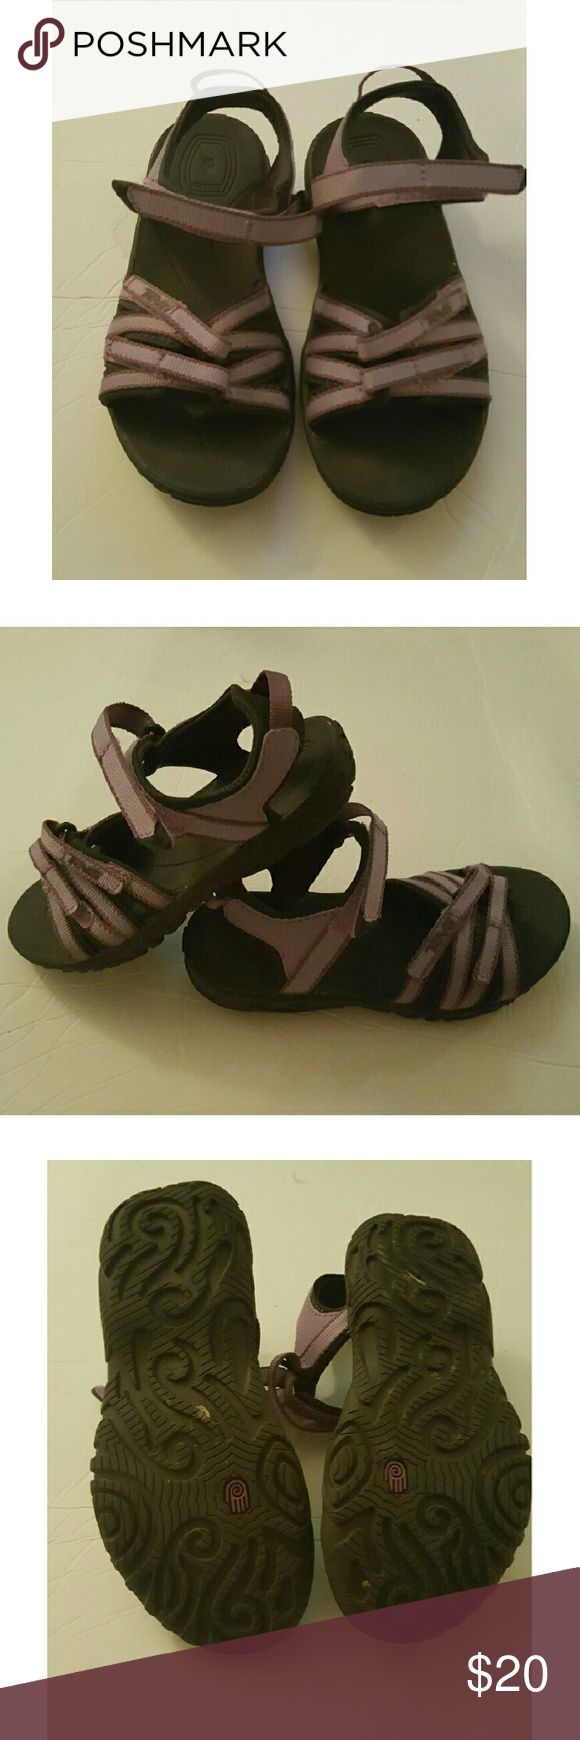 Teva kids sandals Like new. Purple with black sole. Worn once Teva Shoes Sandals & Flip Flops